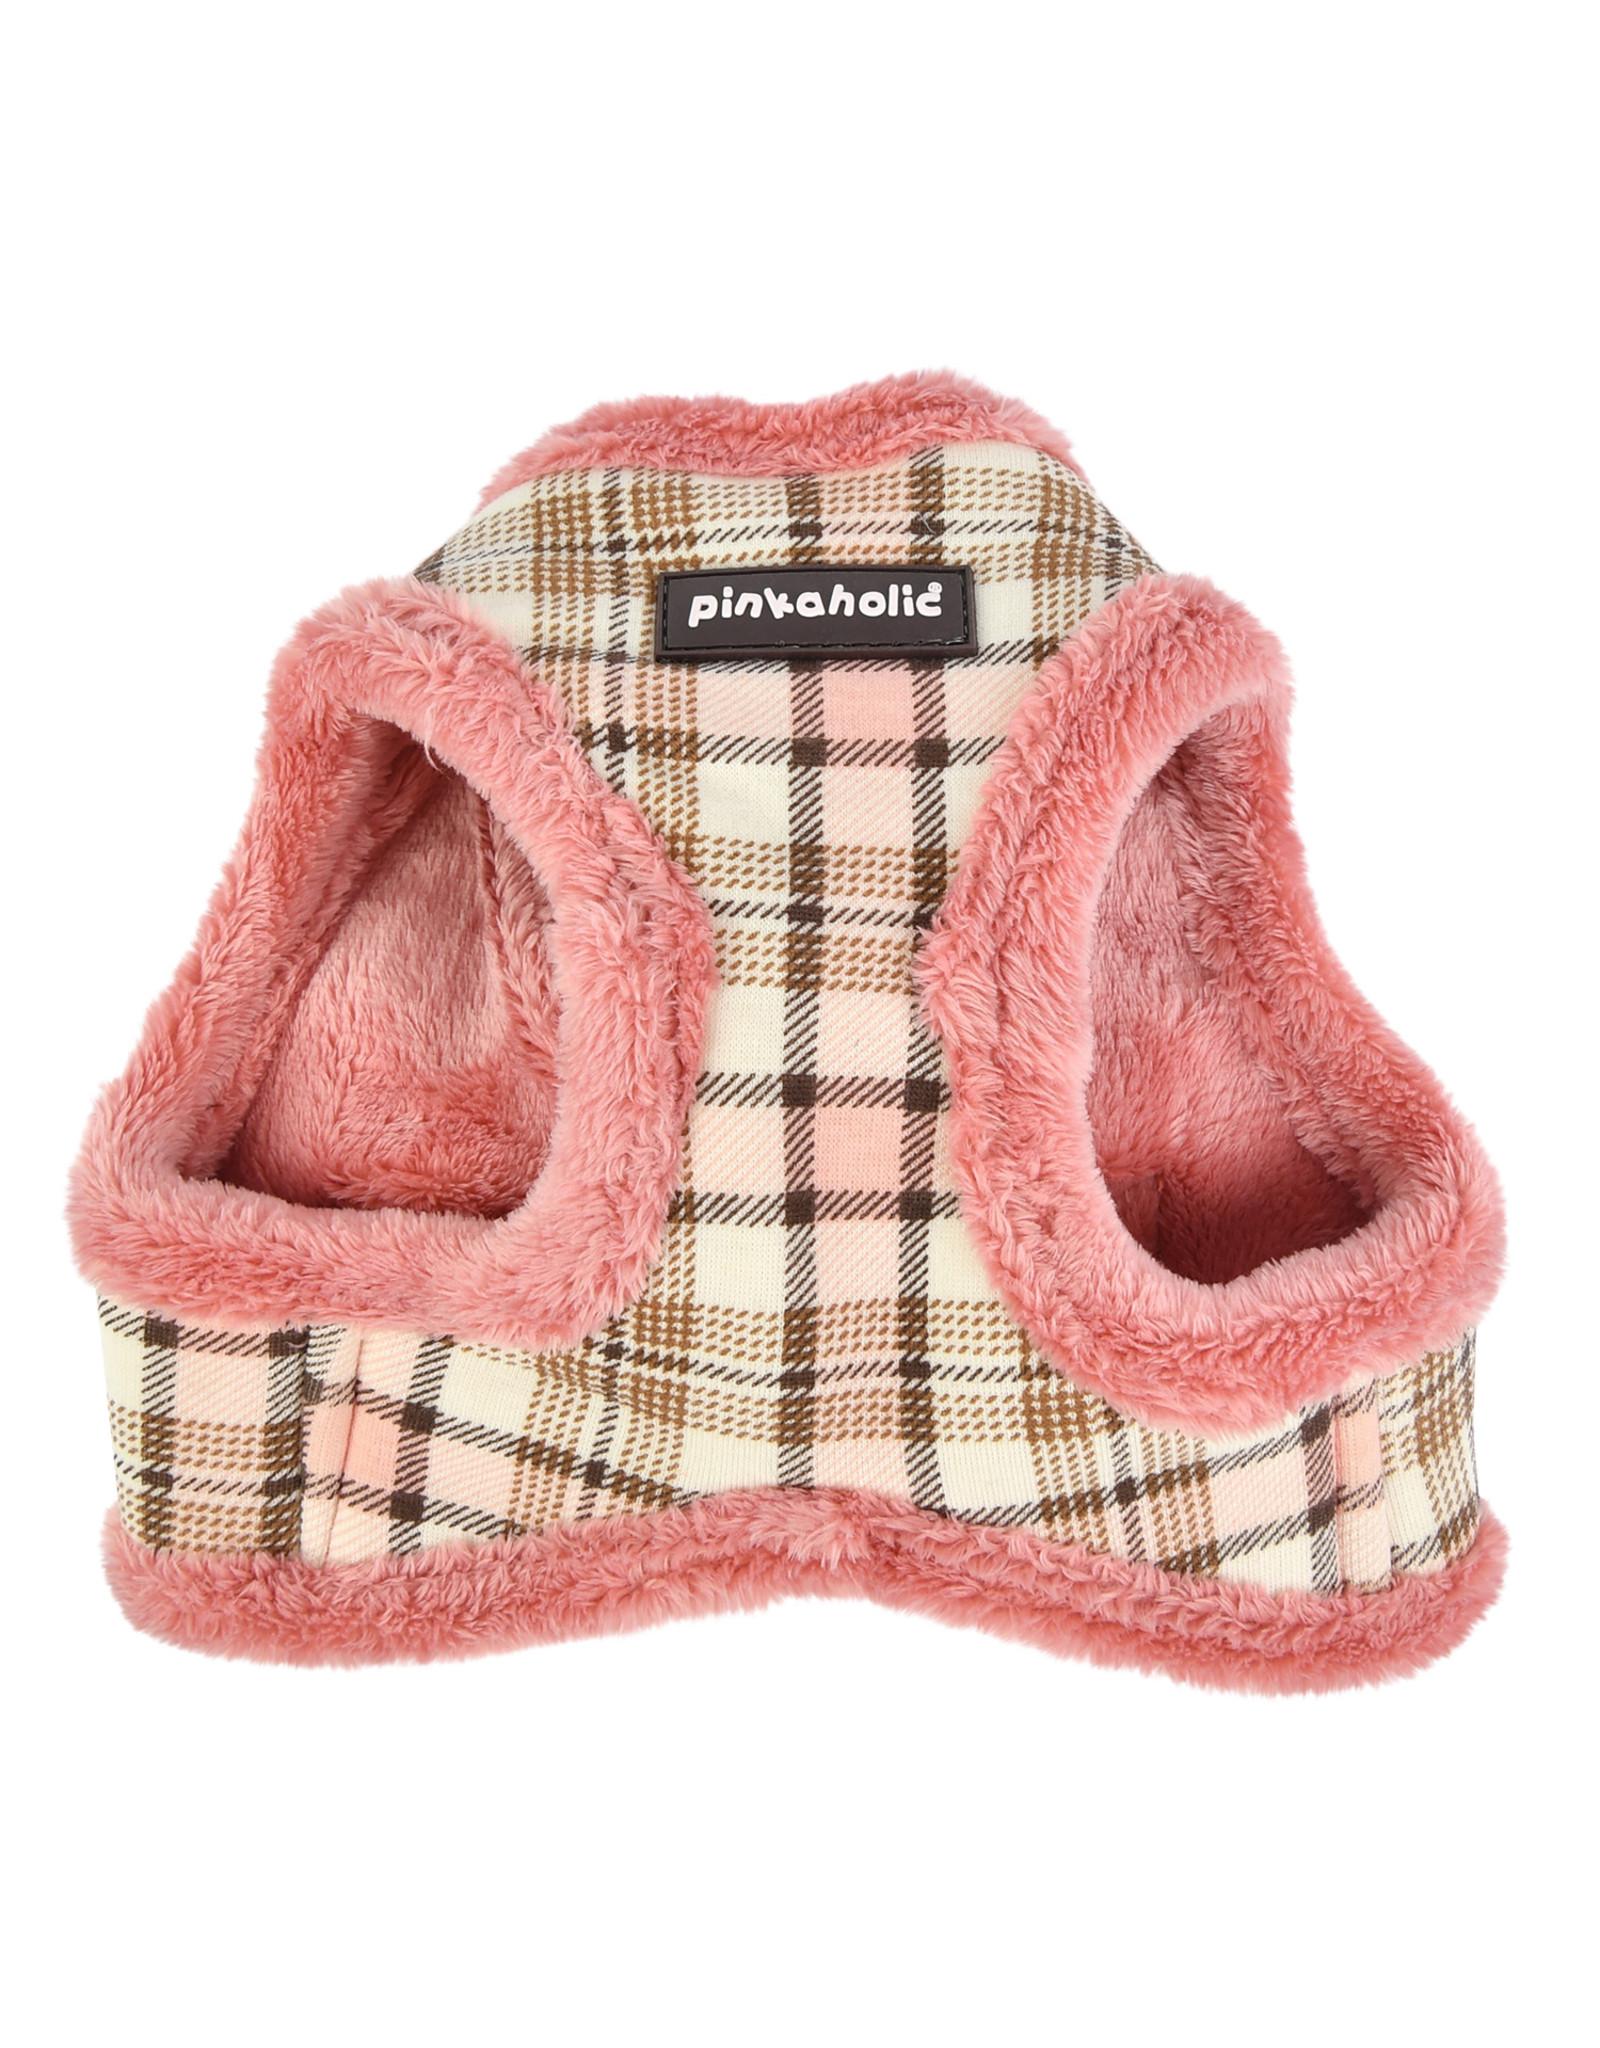 Pinkaholic Pinkaholic Aline Pinka Harness Indian Pink